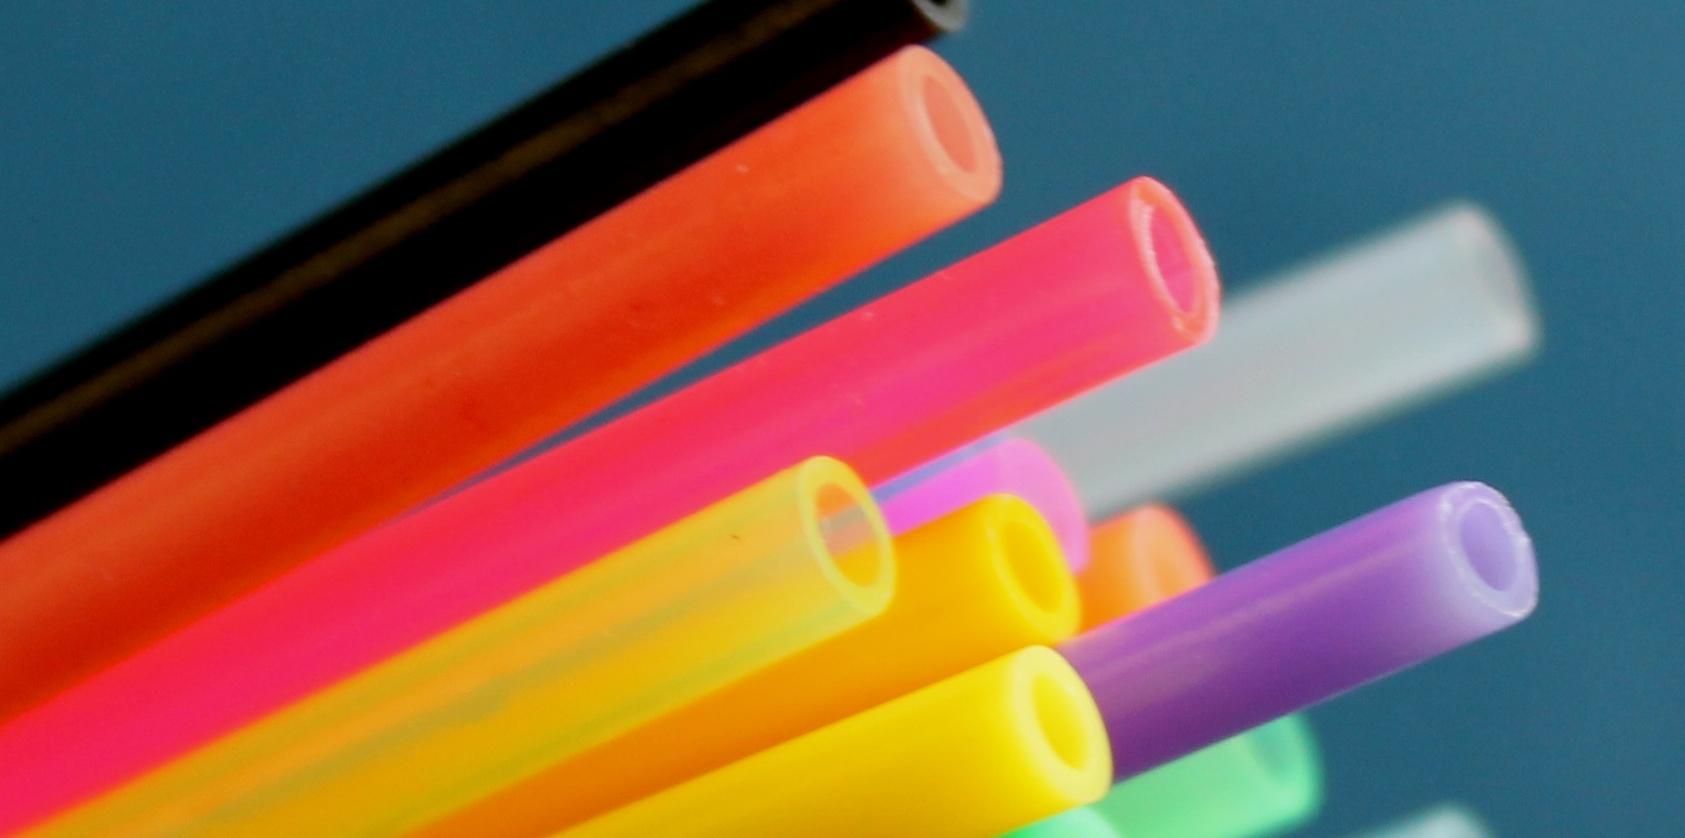 Tubing & Accessories -